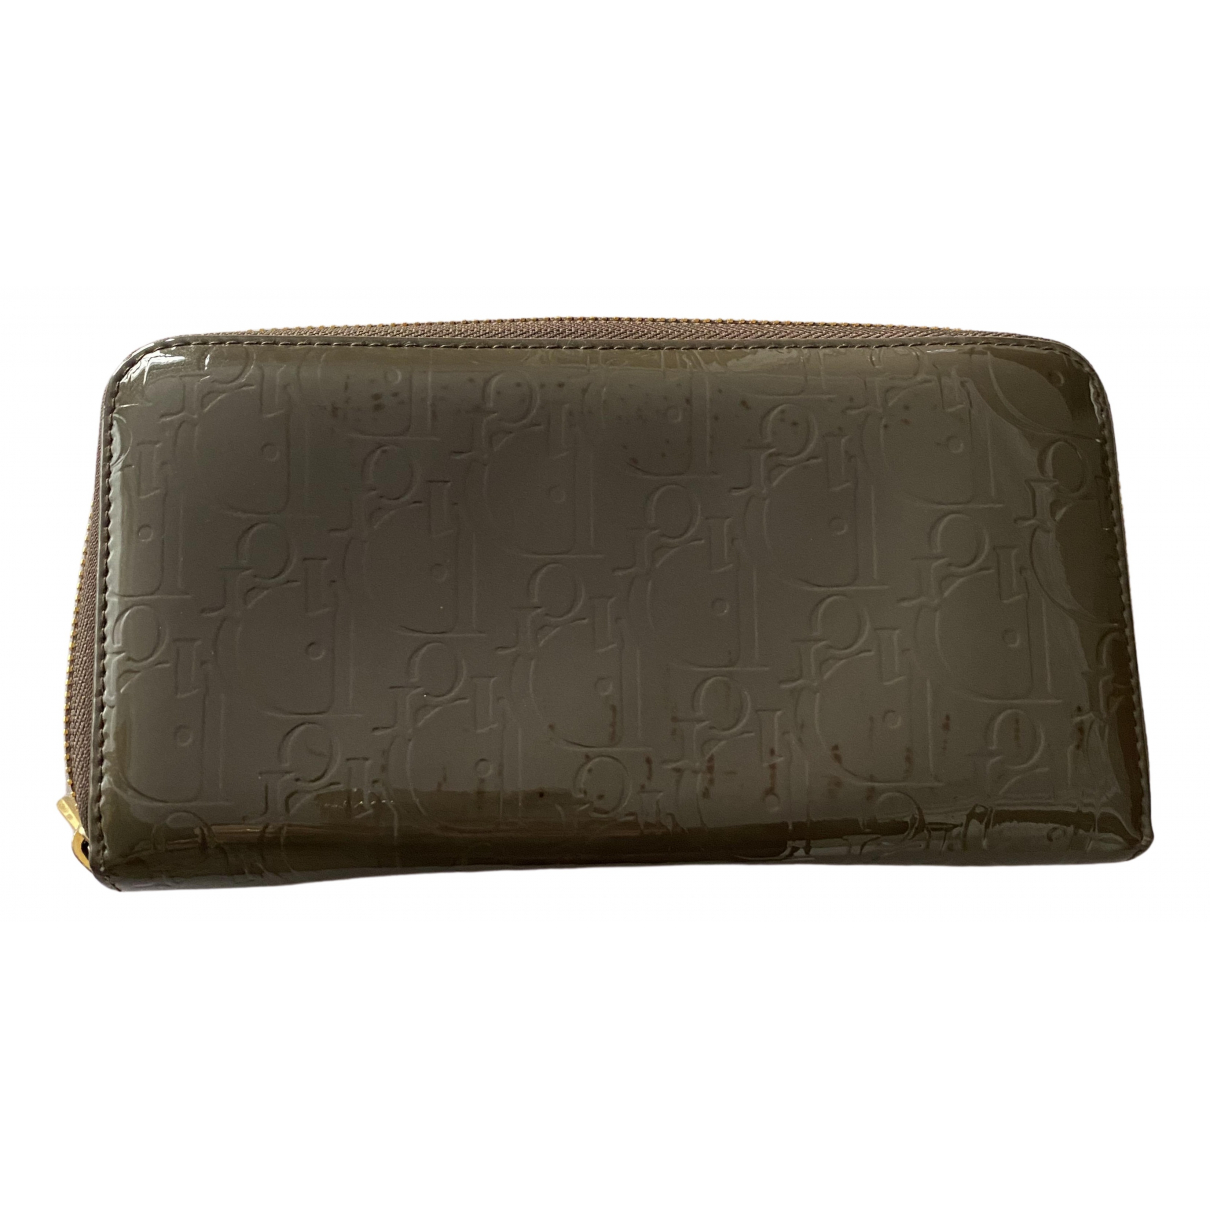 Dior \N Portemonnaie in  Khaki Lackleder